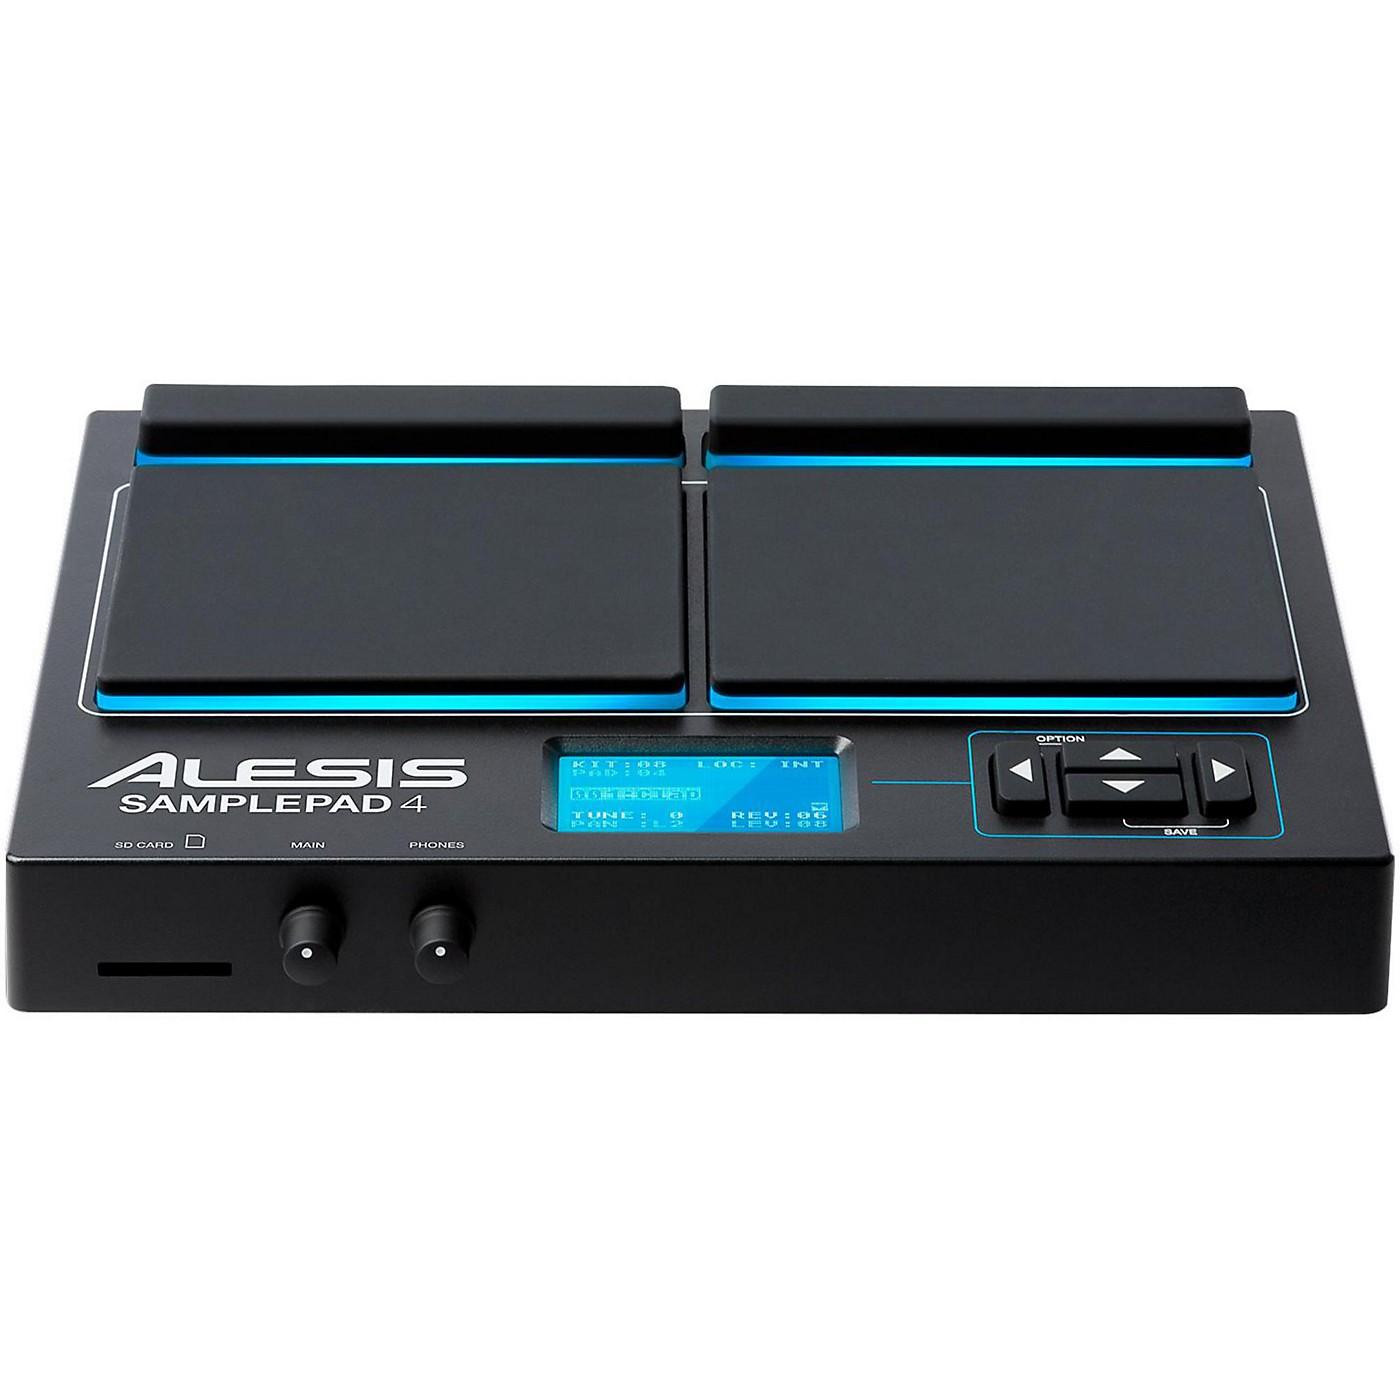 Alesis Sample Pad 4 Percussion and Sample-Triggering Instrument thumbnail